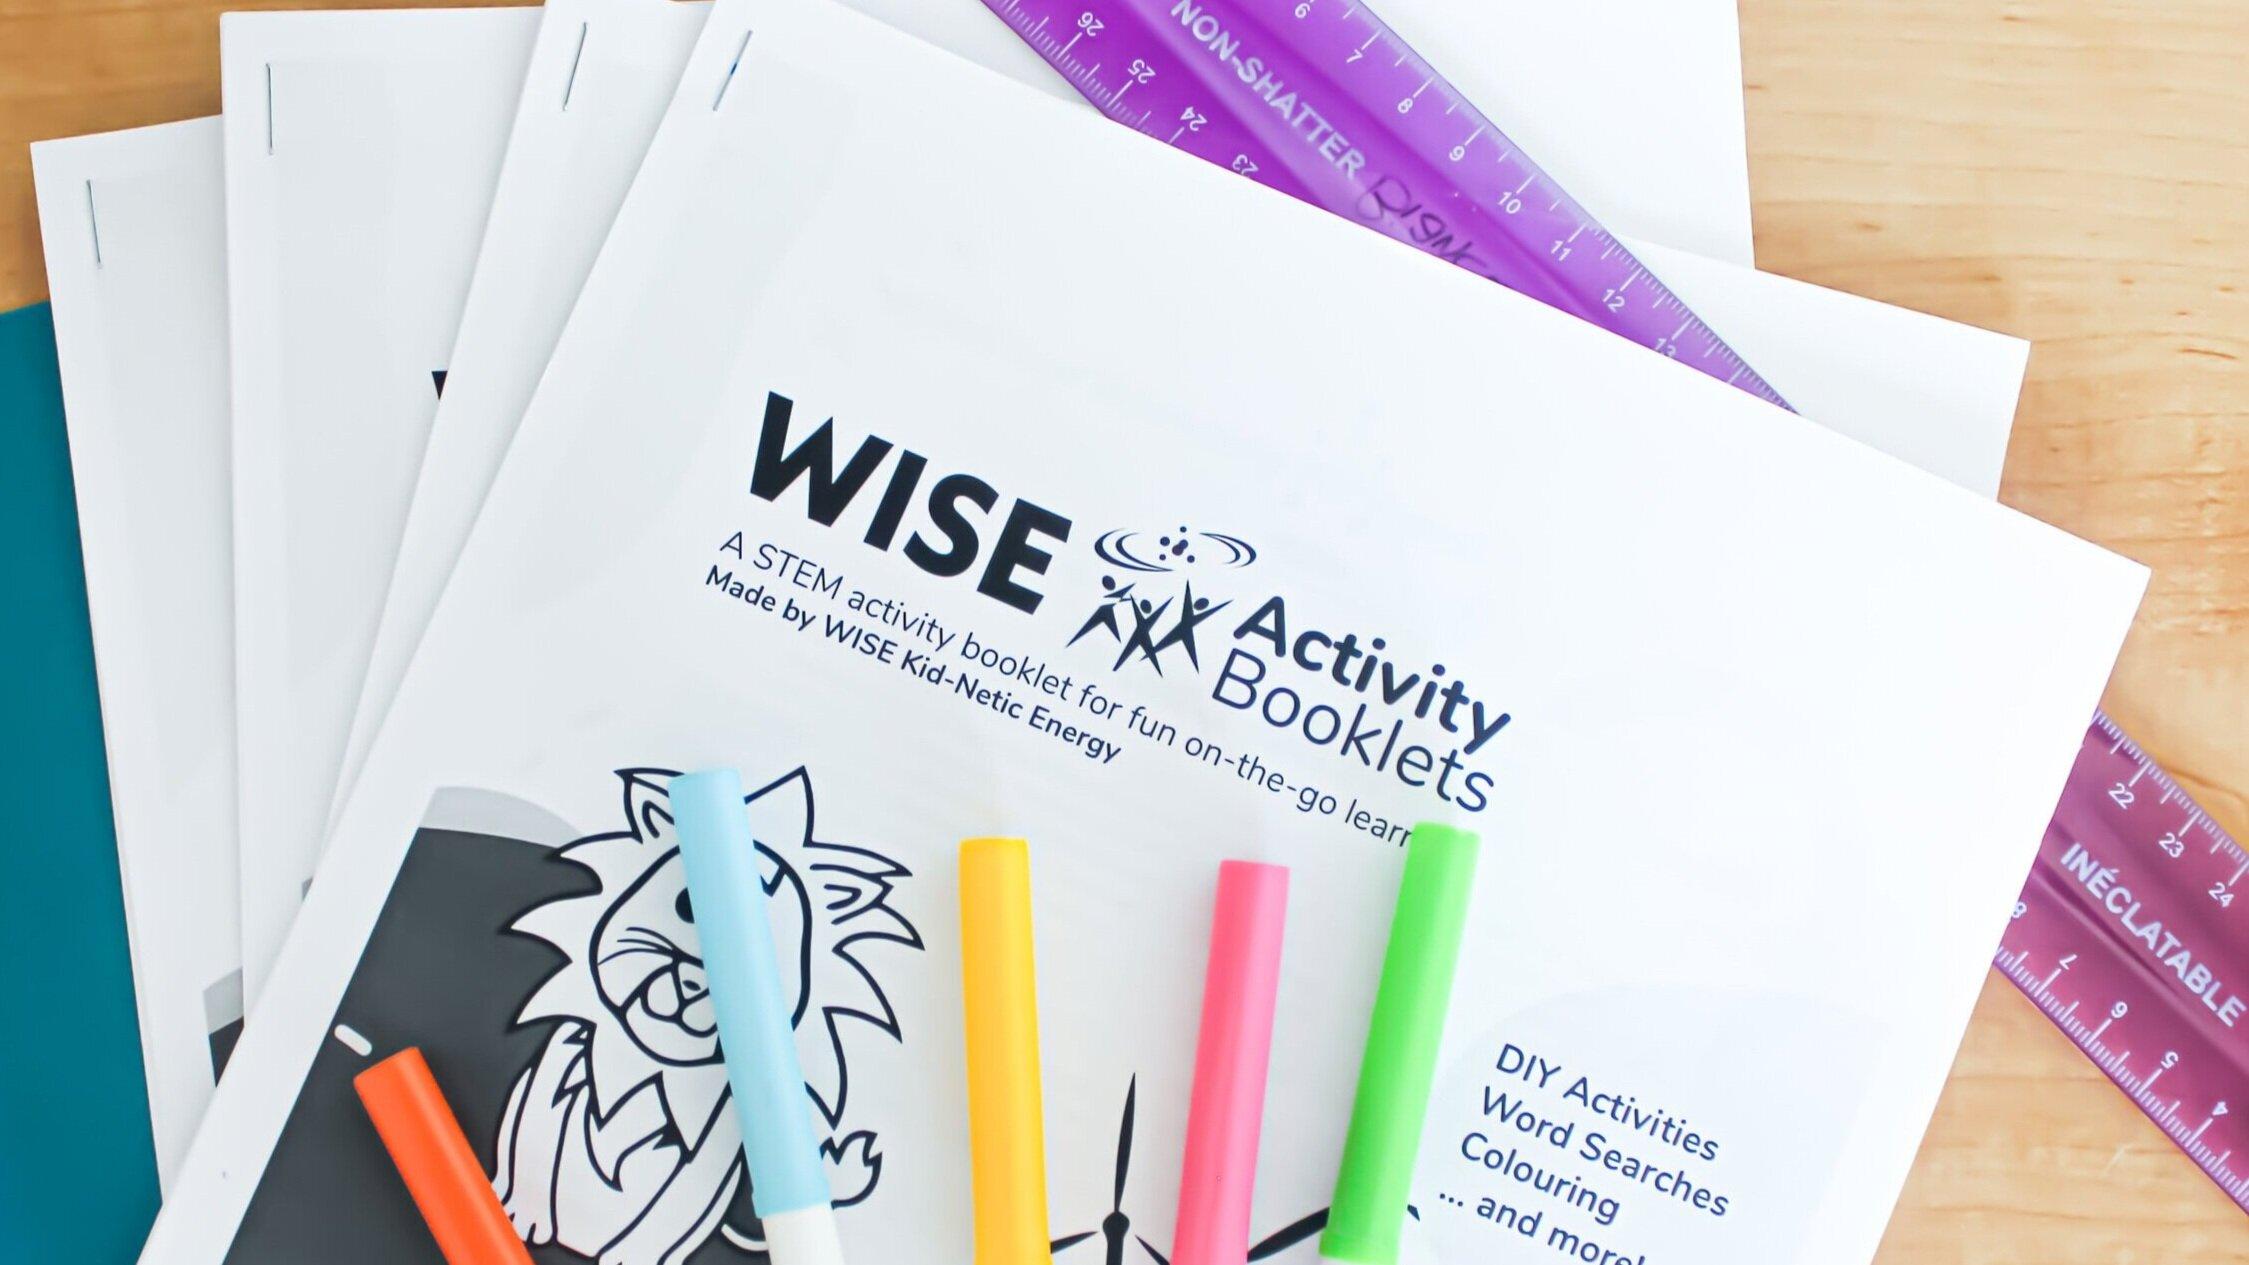 Activity Booklet Worksheets — WISE Kid-Netic Energy [ 1265 x 2249 Pixel ]